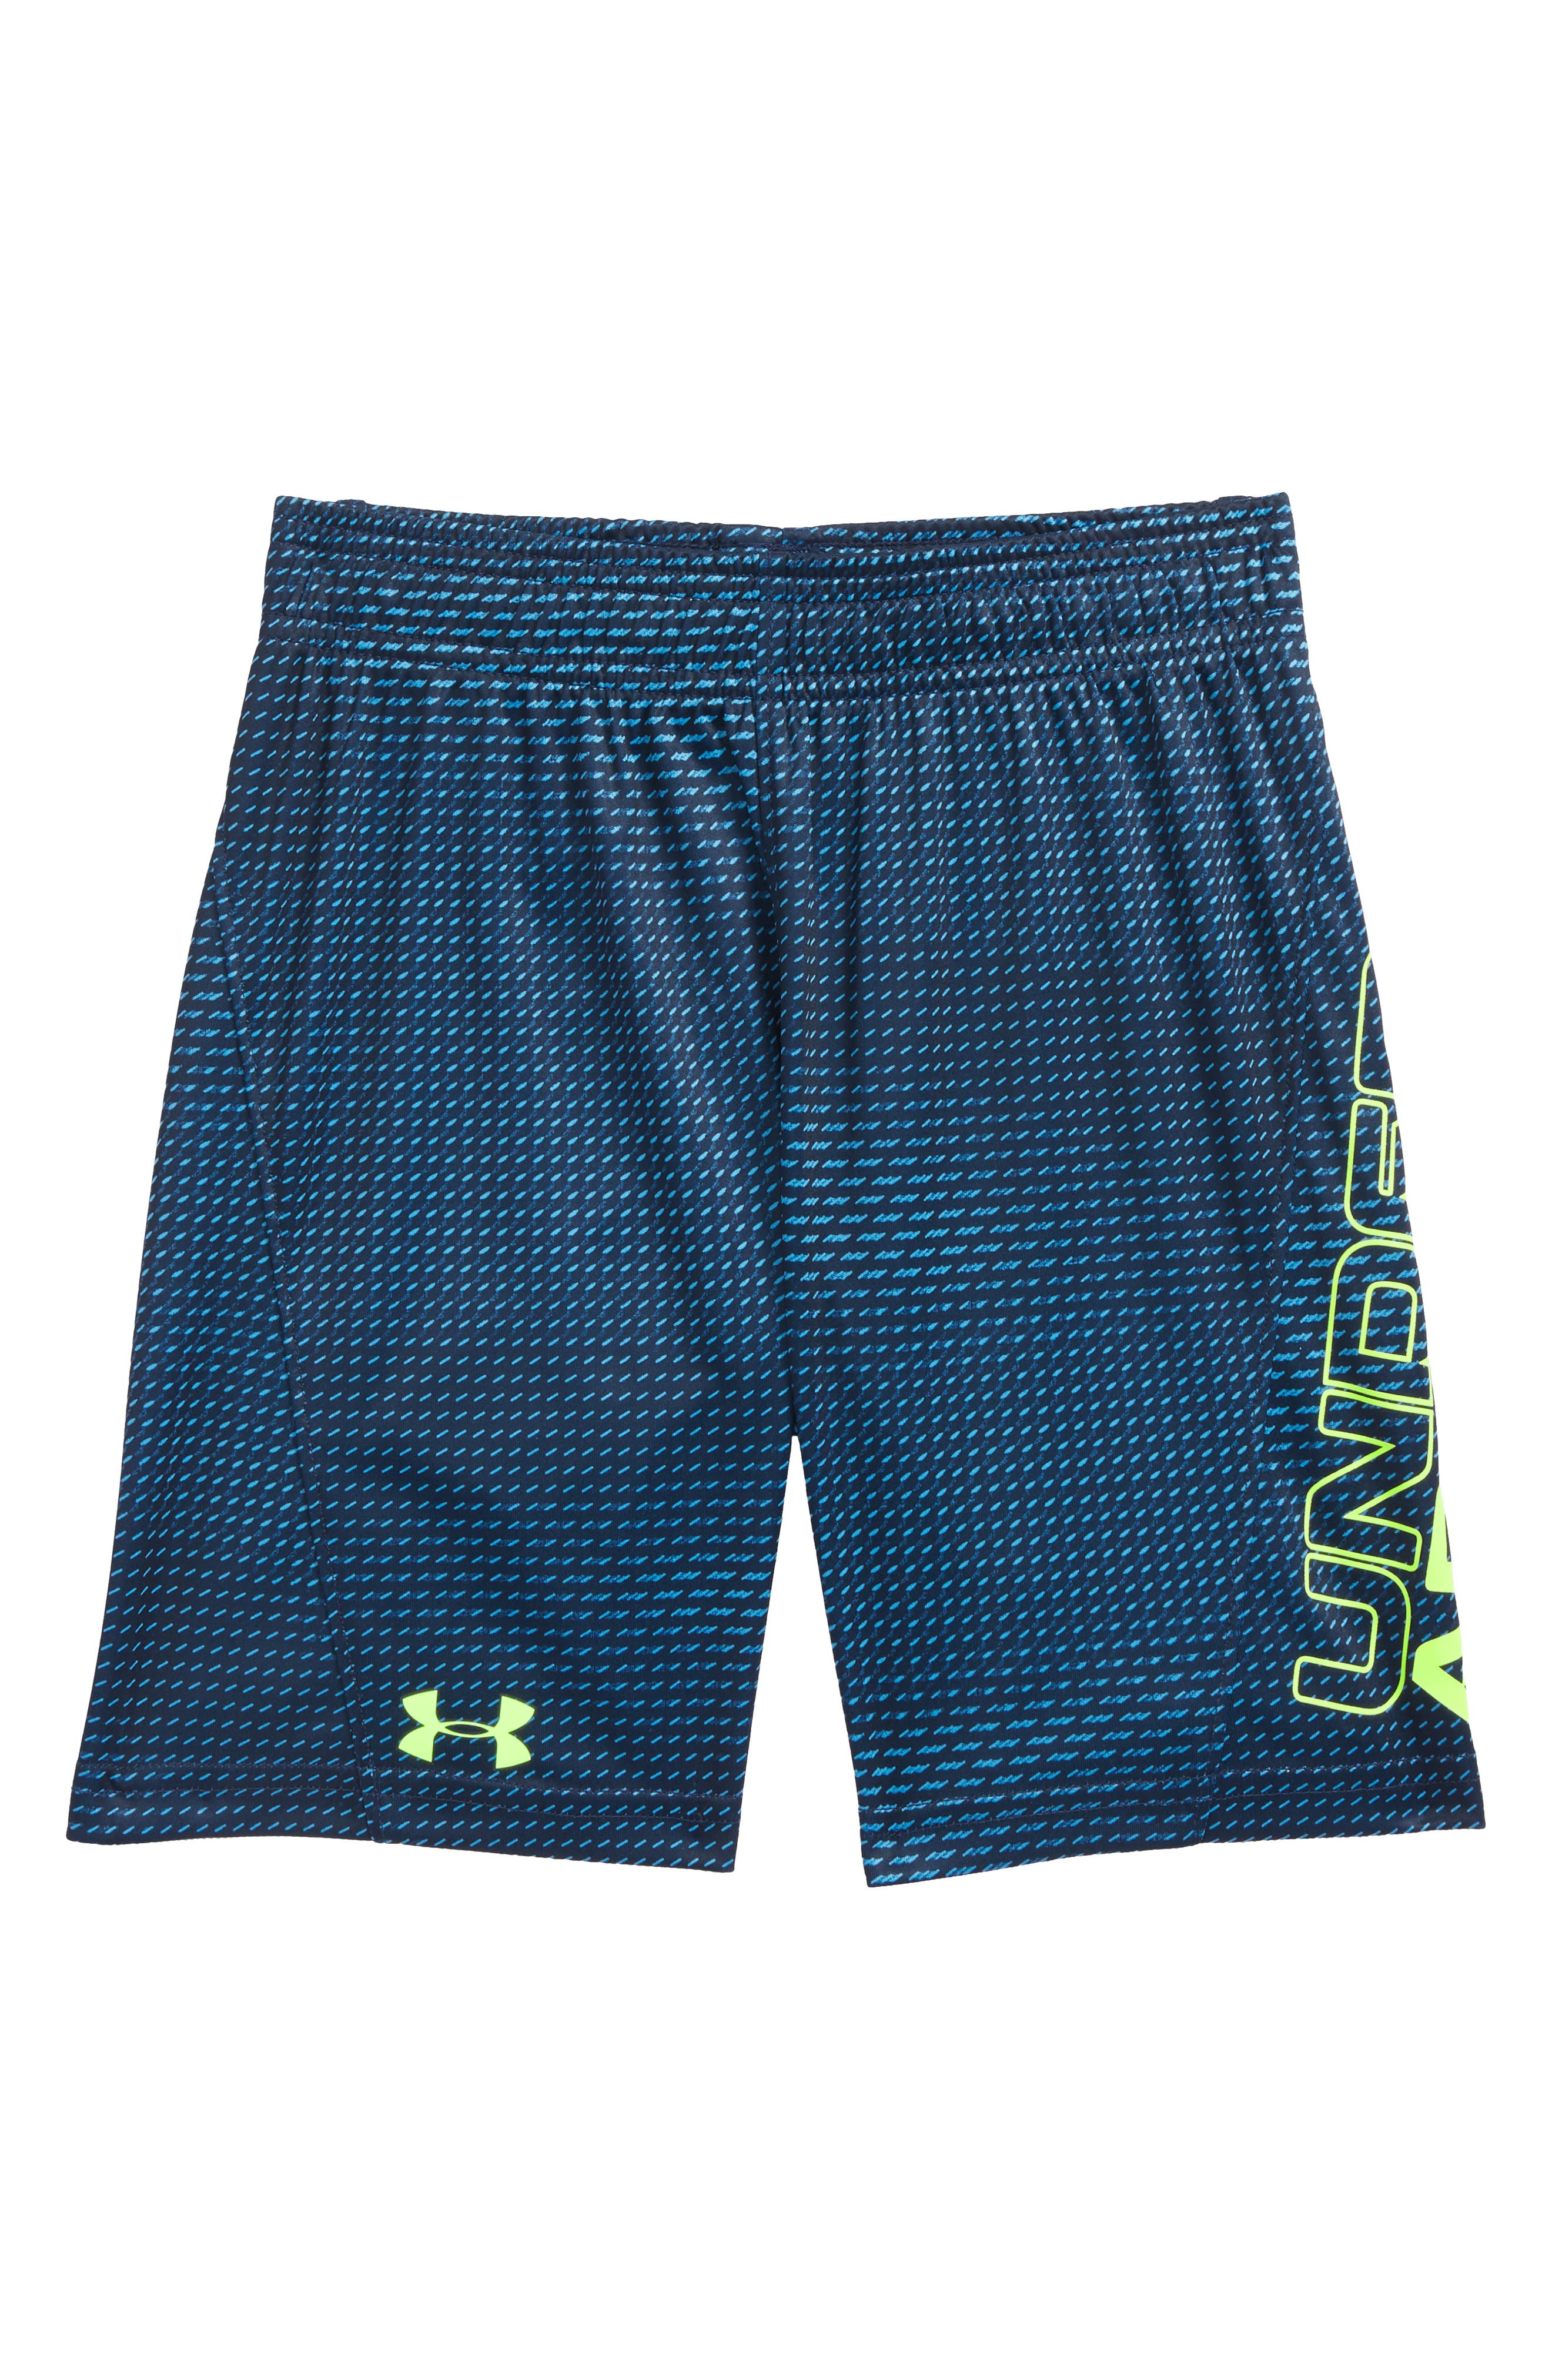 Sync Boost HeatGear<sup>®</sup> Shorts,                         Main,                         color, 450